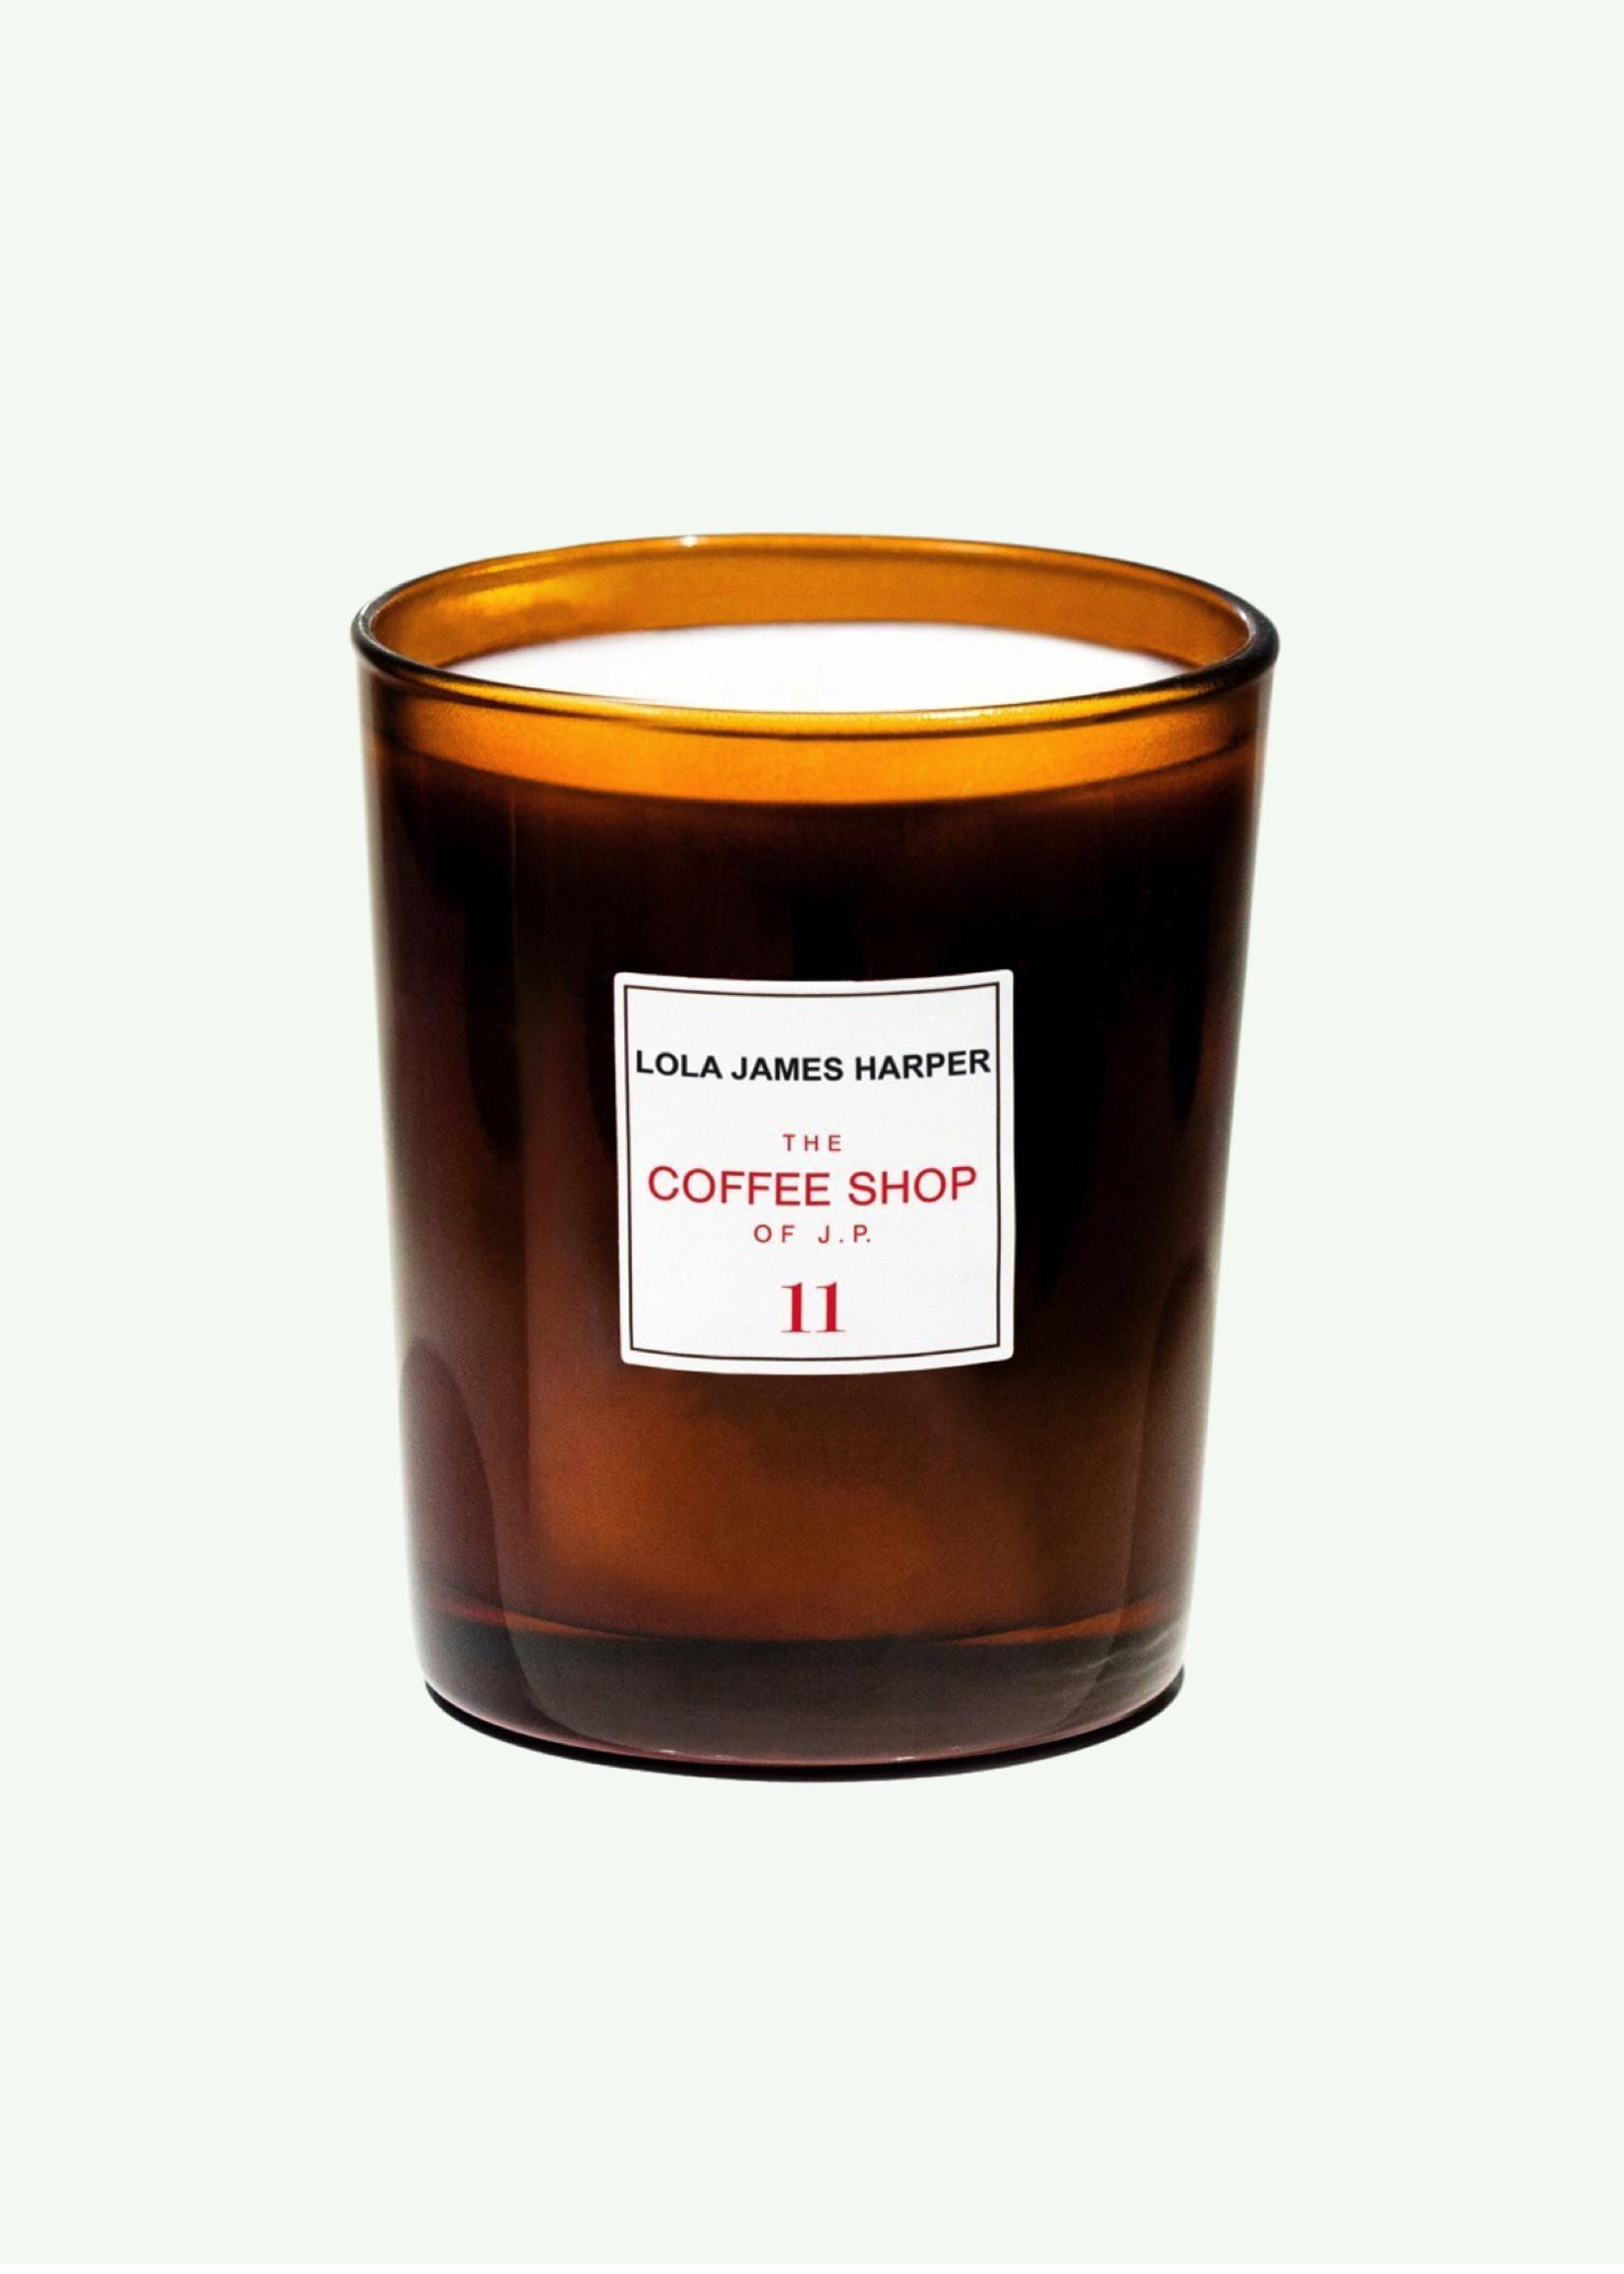 Lola James Harper Lola James Harper - The Coffee Shop of JP - Geurkaars 190 gr